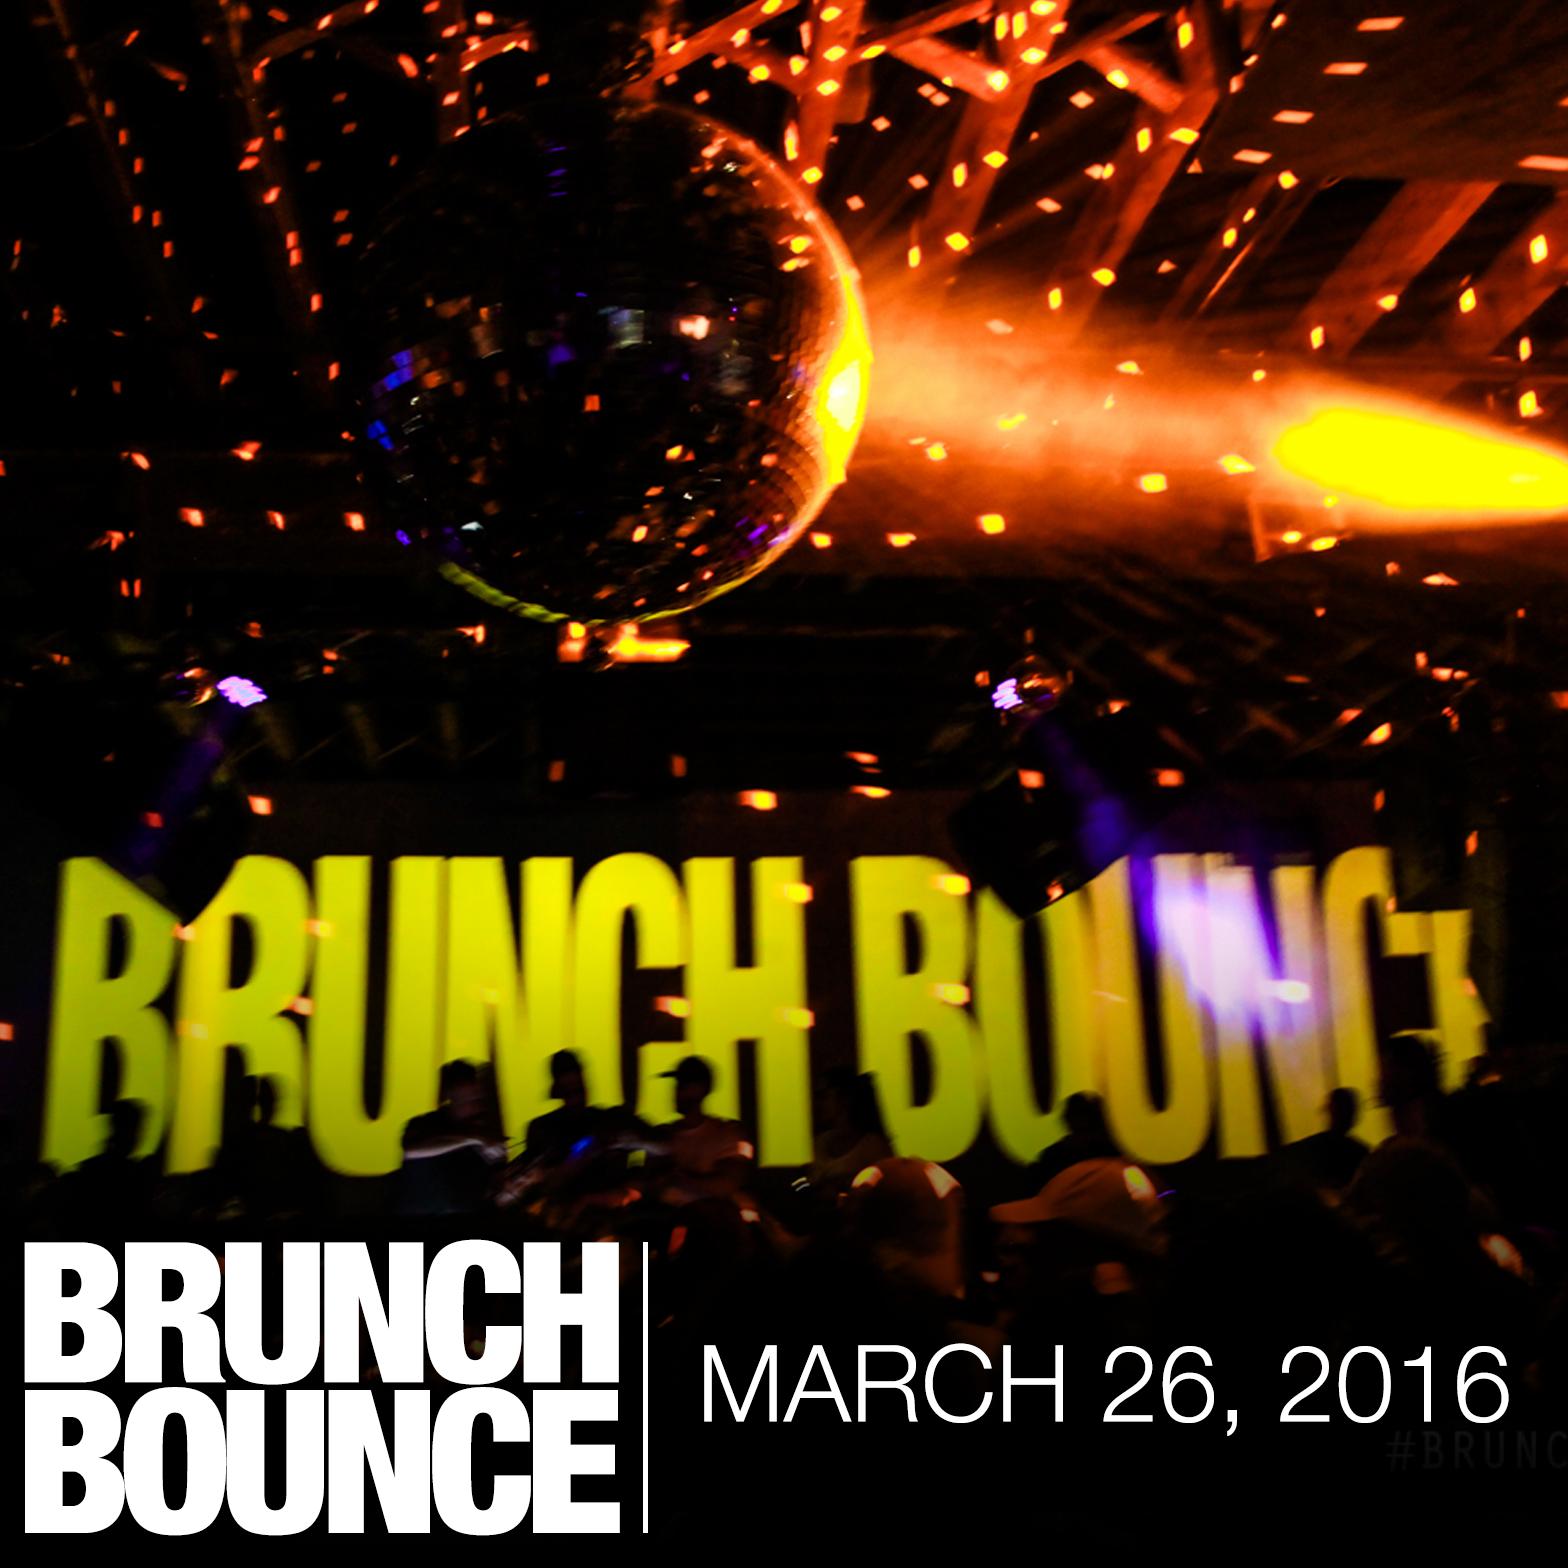 Brunch Bounce 3.26.16